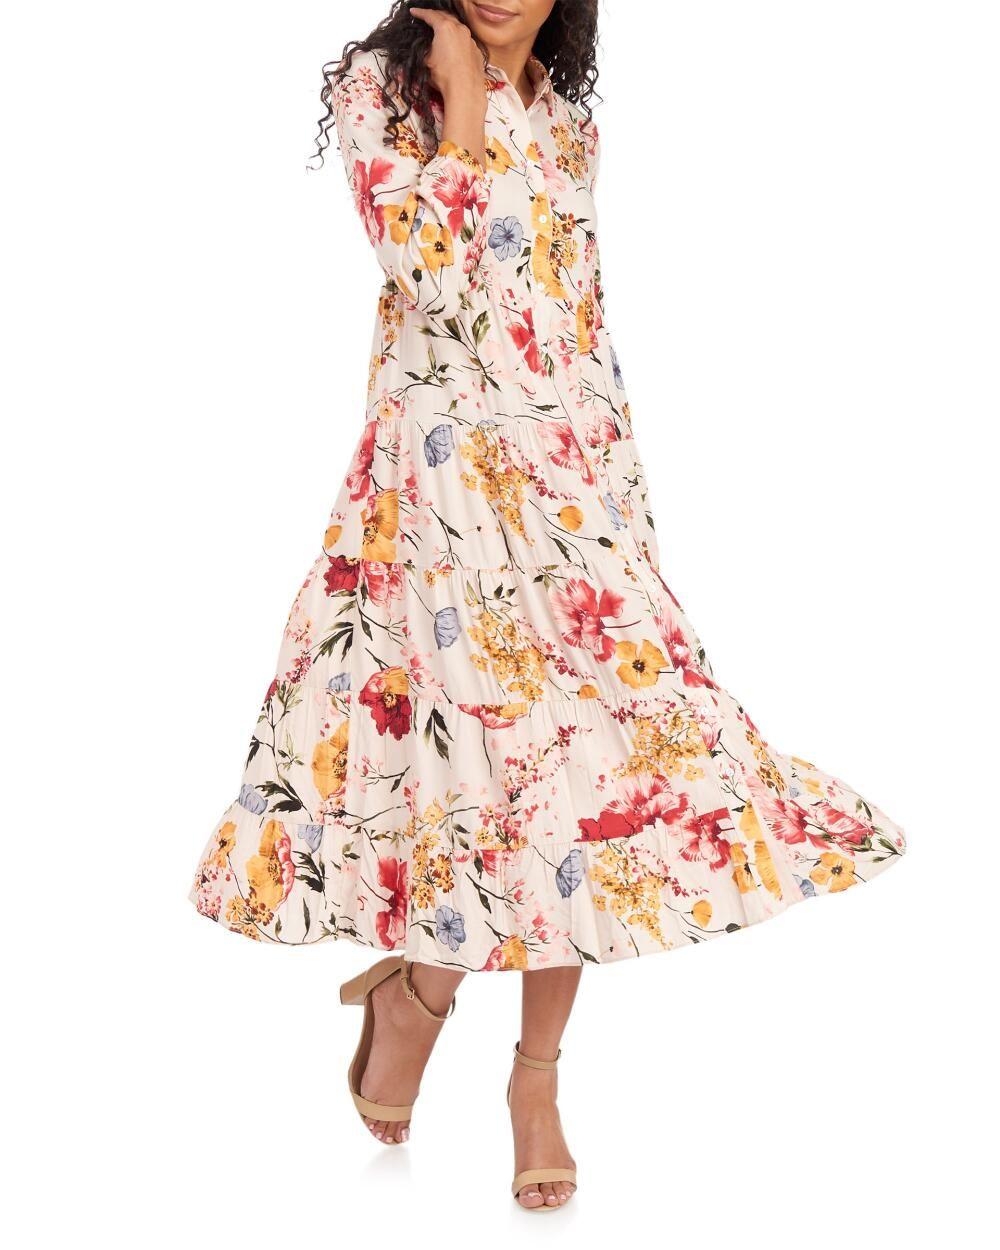 Philosophy Floral Tiered Maxi Shirt Dress Maxi Shirt Dress Occasion Maxi Dresses Dresses [ 1250 x 1000 Pixel ]